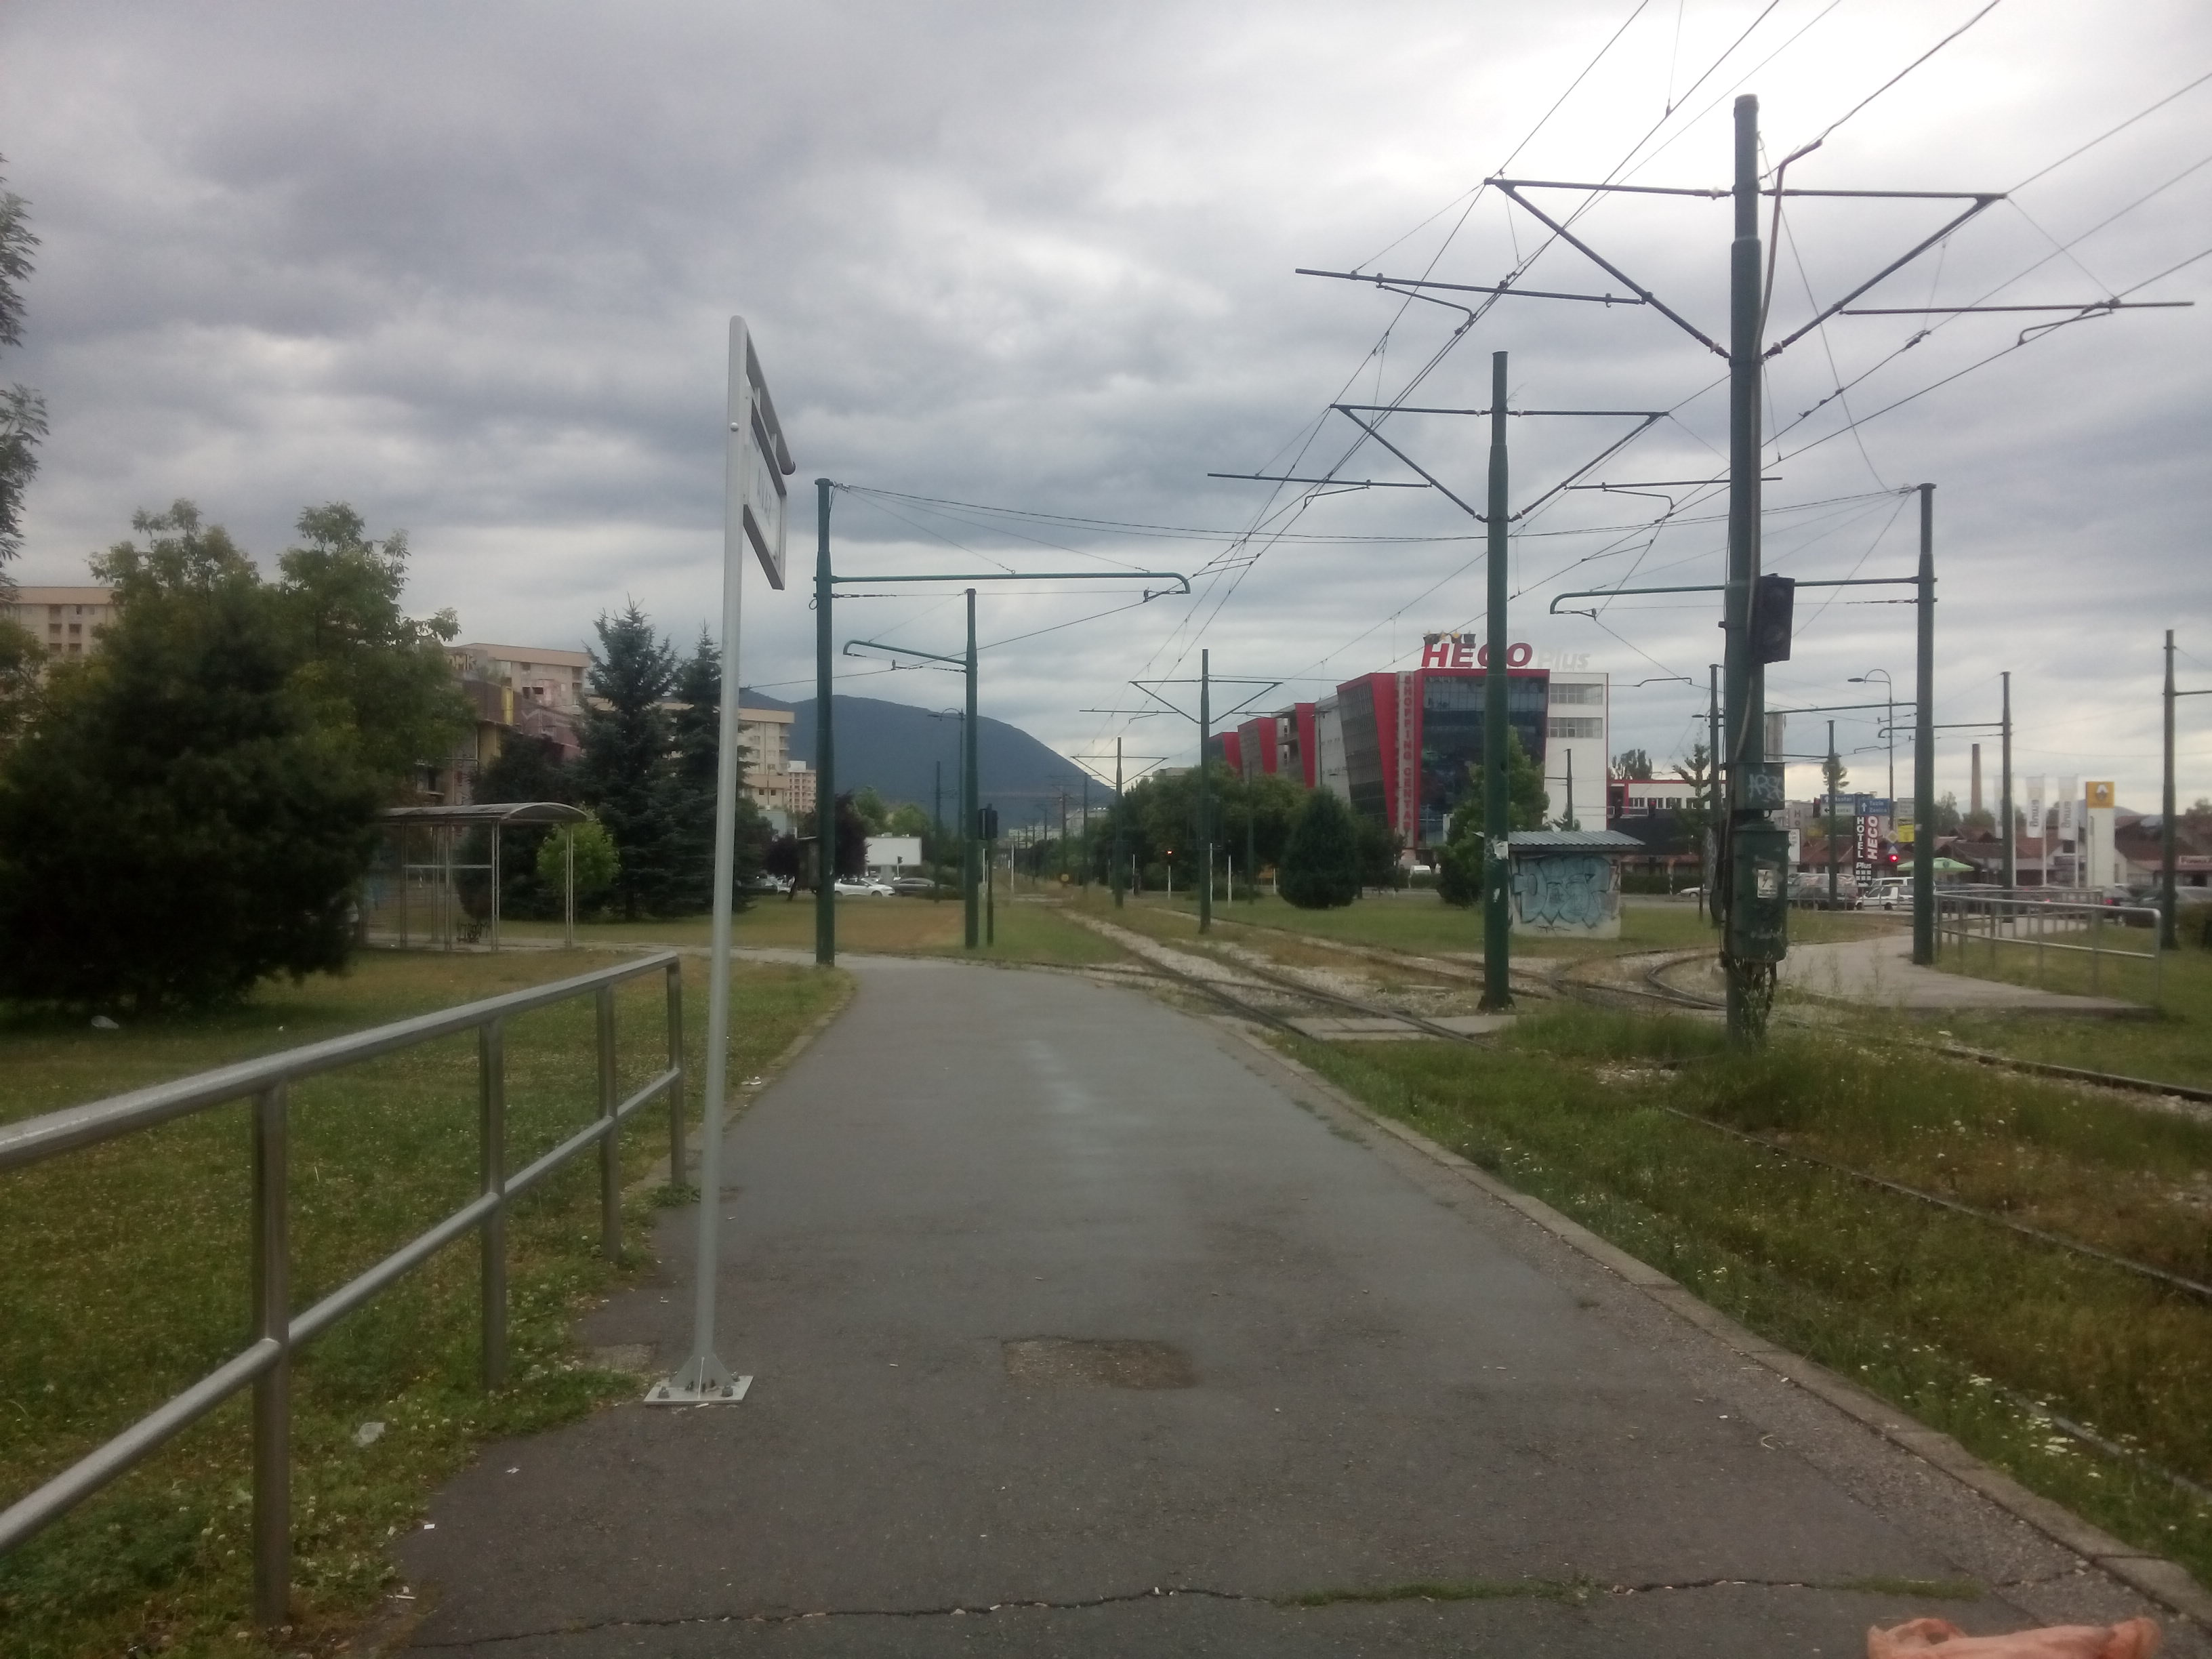 https://i.amy.gy/2017-sarajevo/IMG_20170702_134505.jpg